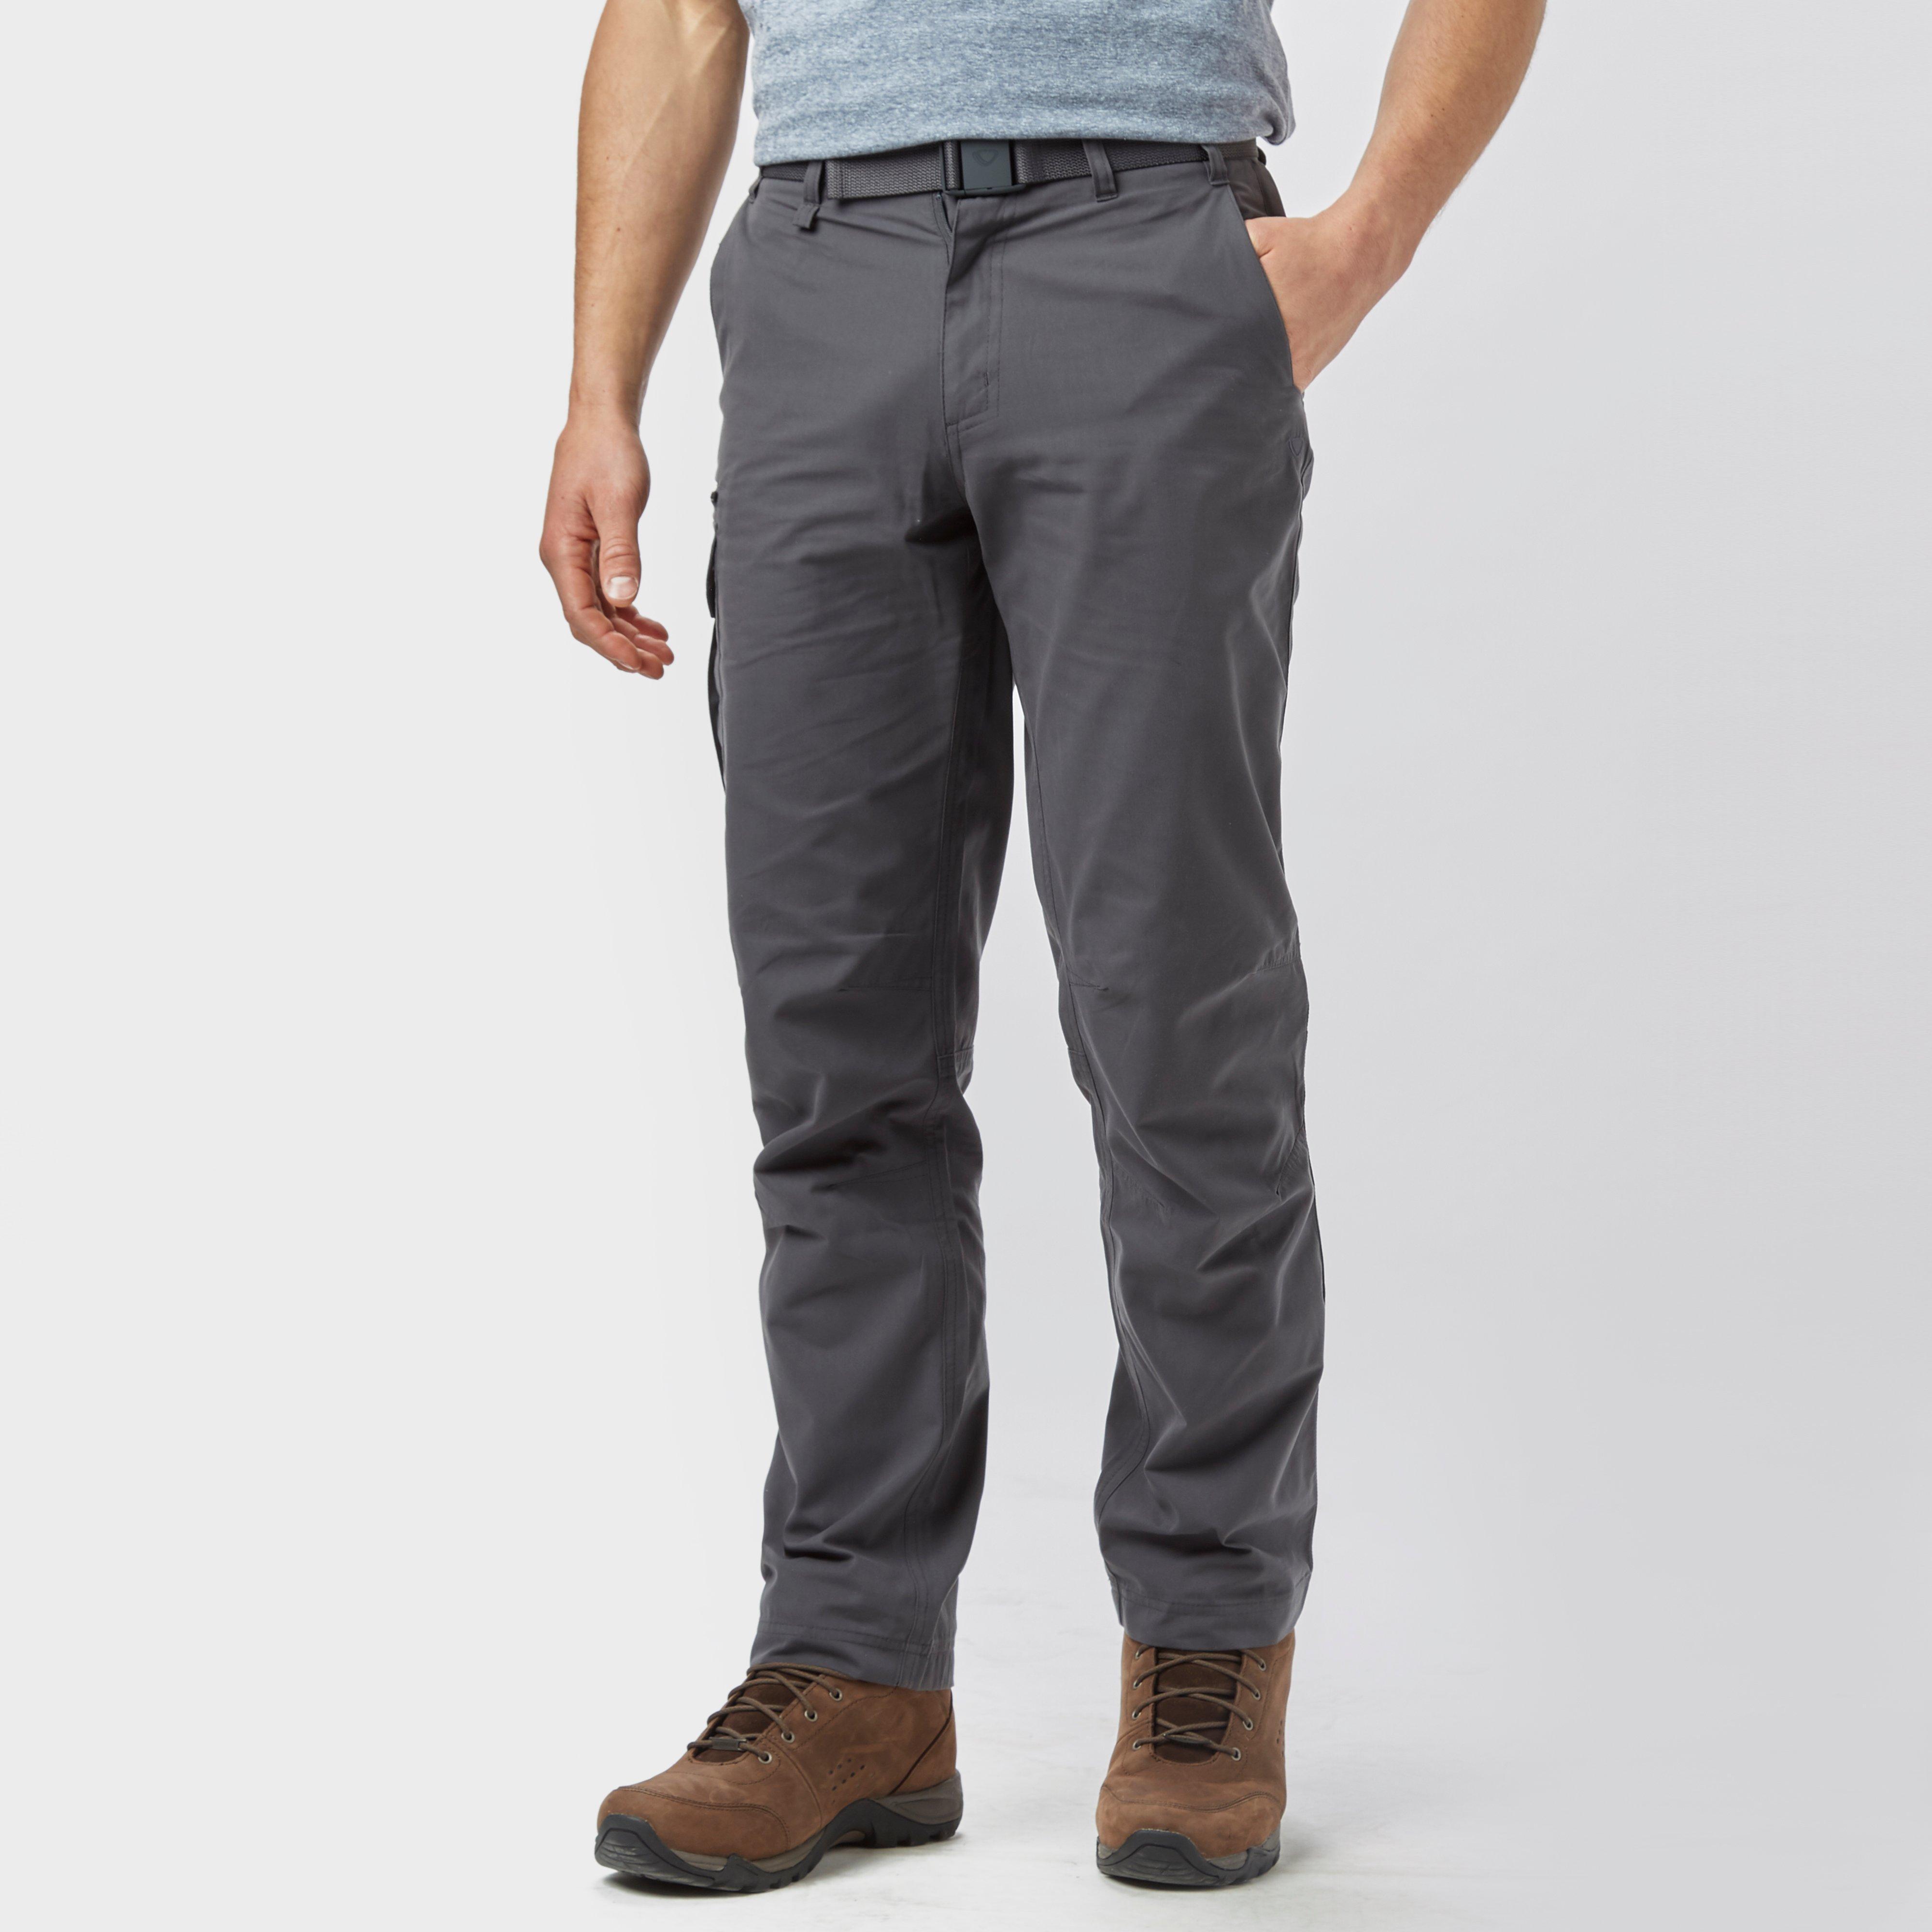 Brasher Brasher Mens Walking Trousers - Grey, Grey